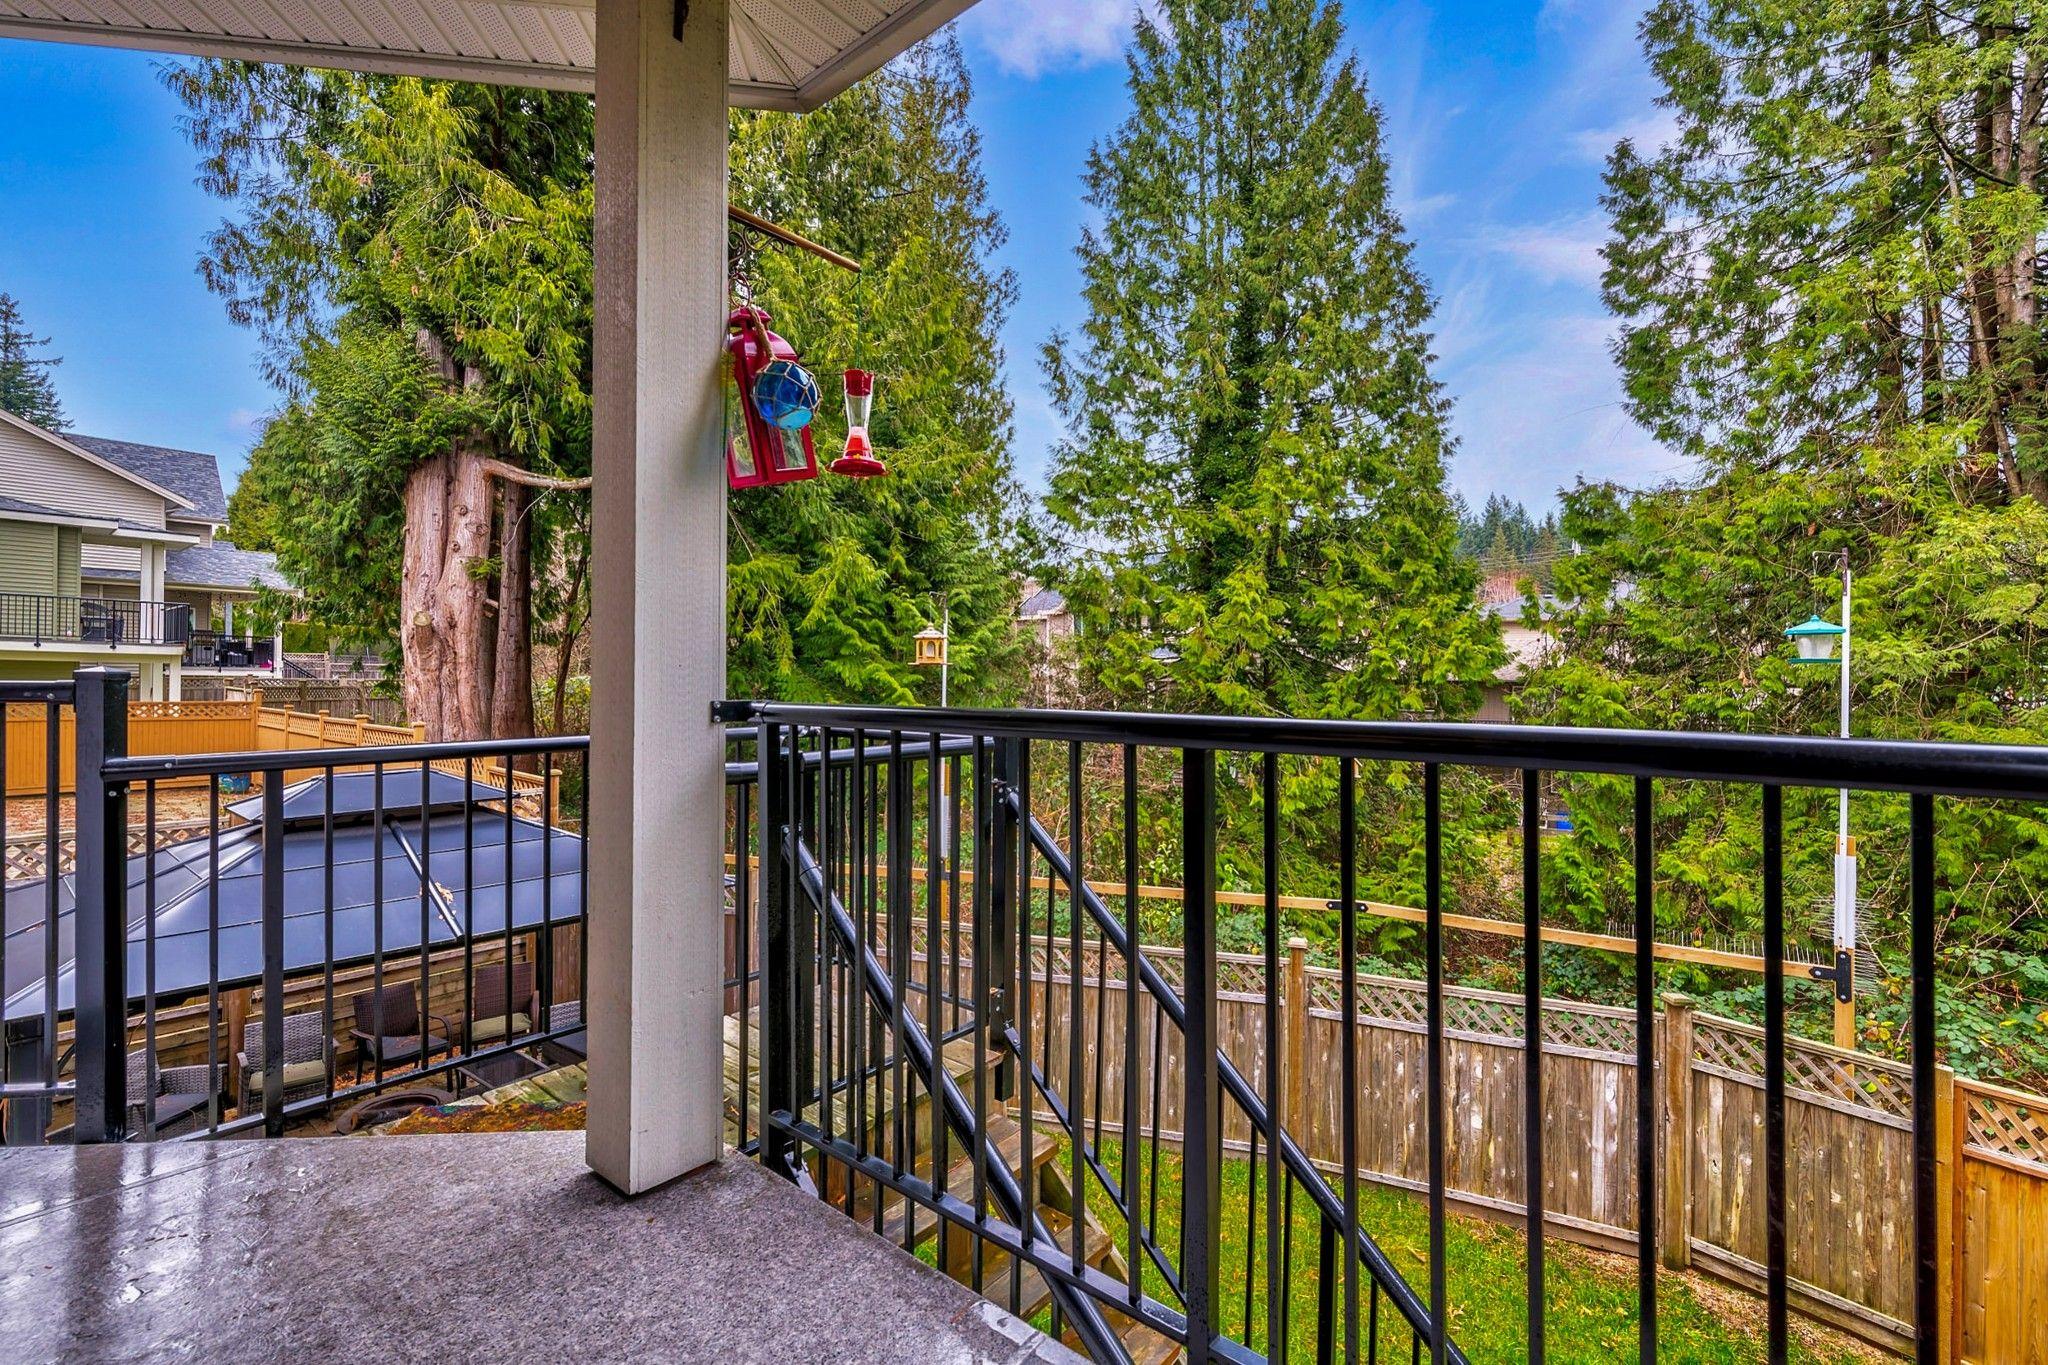 Photo 17: Photos: 1303 Hollybrook Street in Coquitlam: Burke Mountain House for sale : MLS®# R2423196